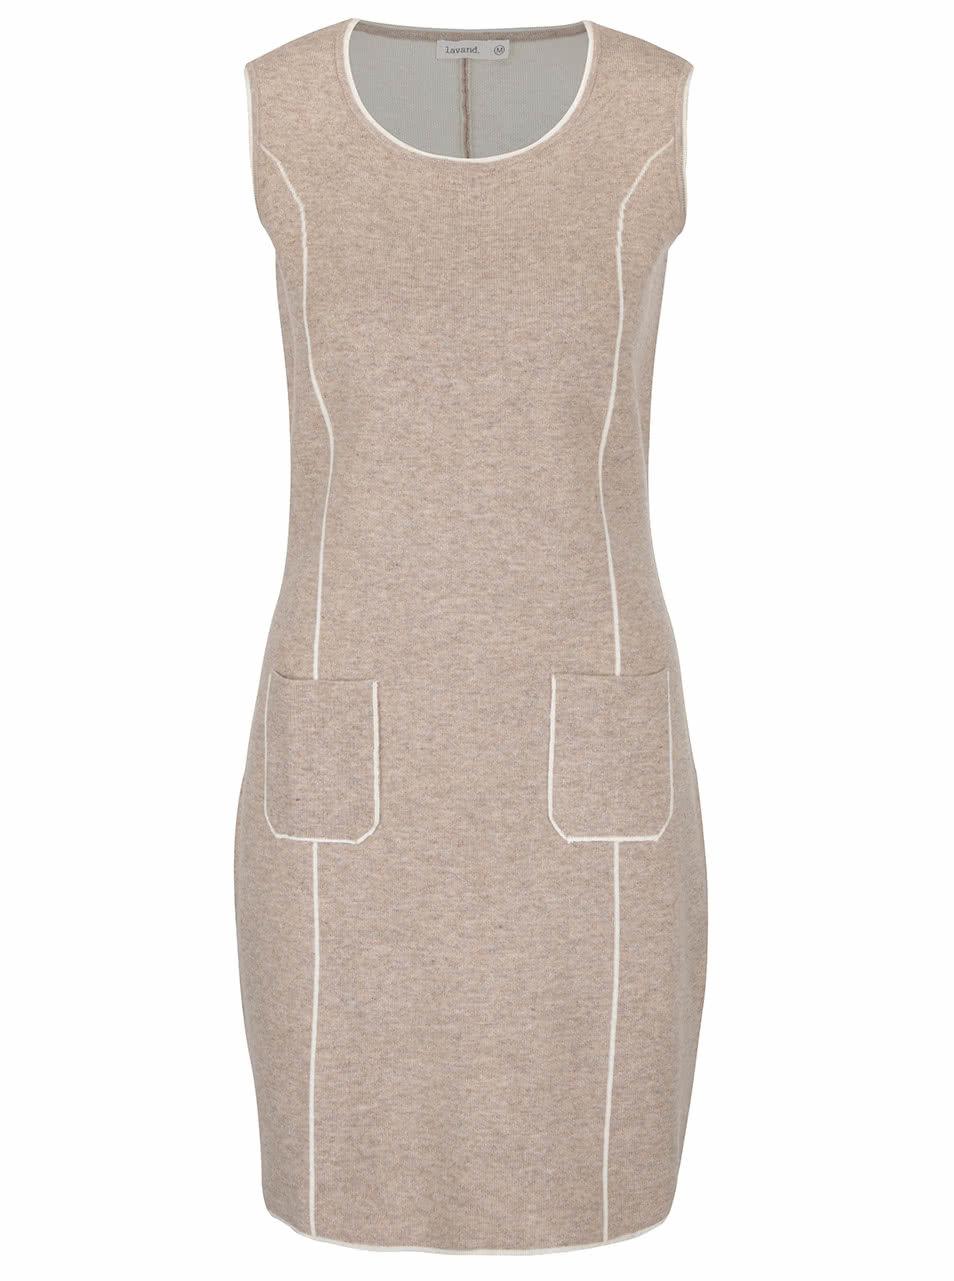 Béžové svetrové šaty bez rukávů Lavand ... 930ca3fd6d5